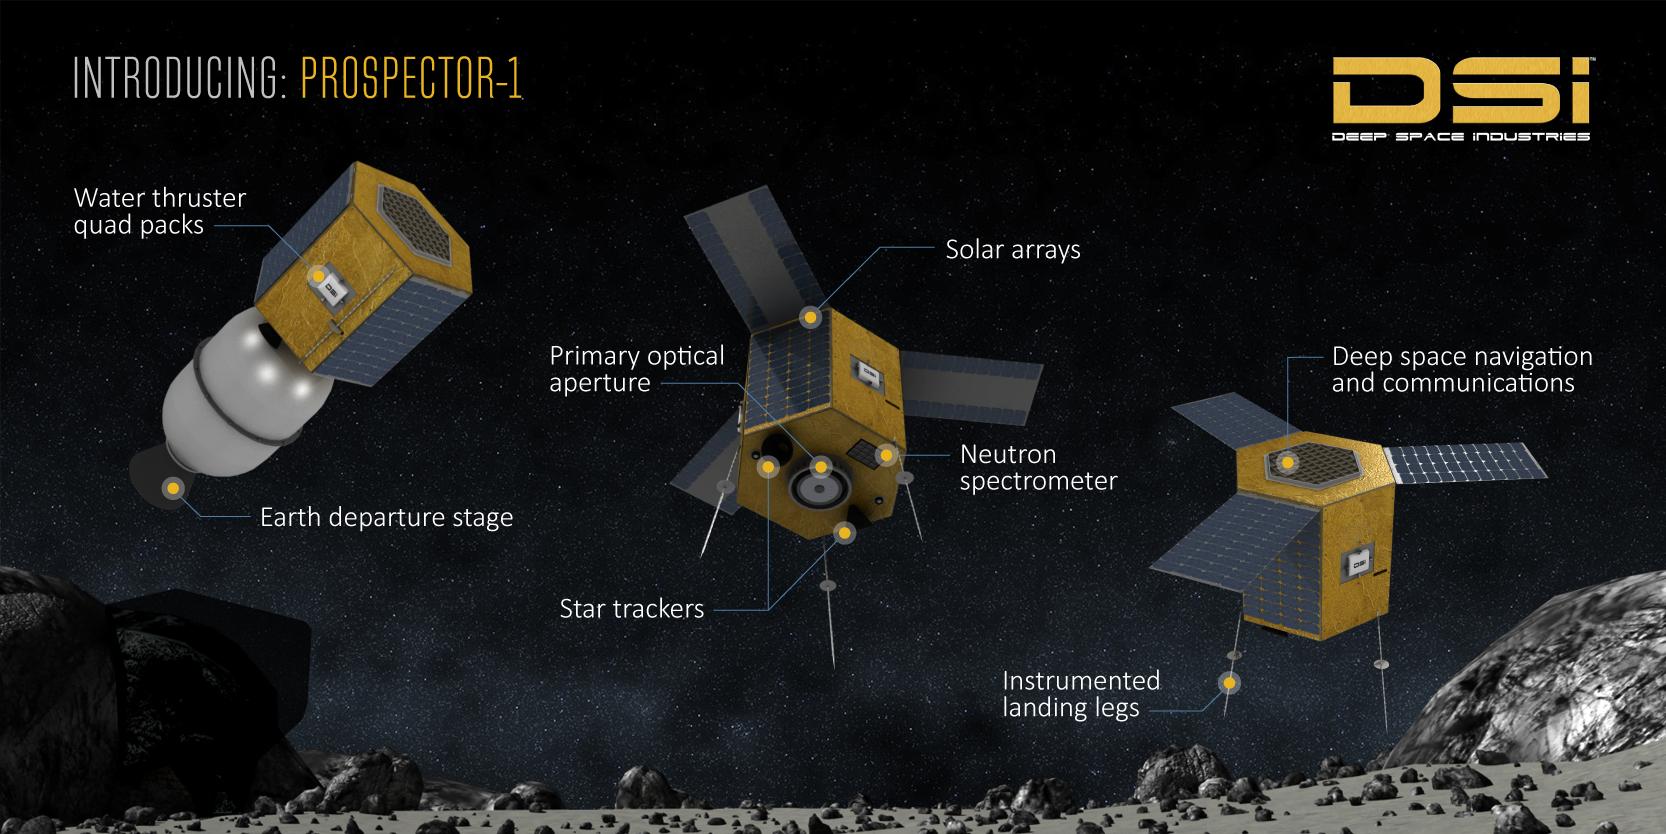 DSI_Prospector1_Infographic_Sm